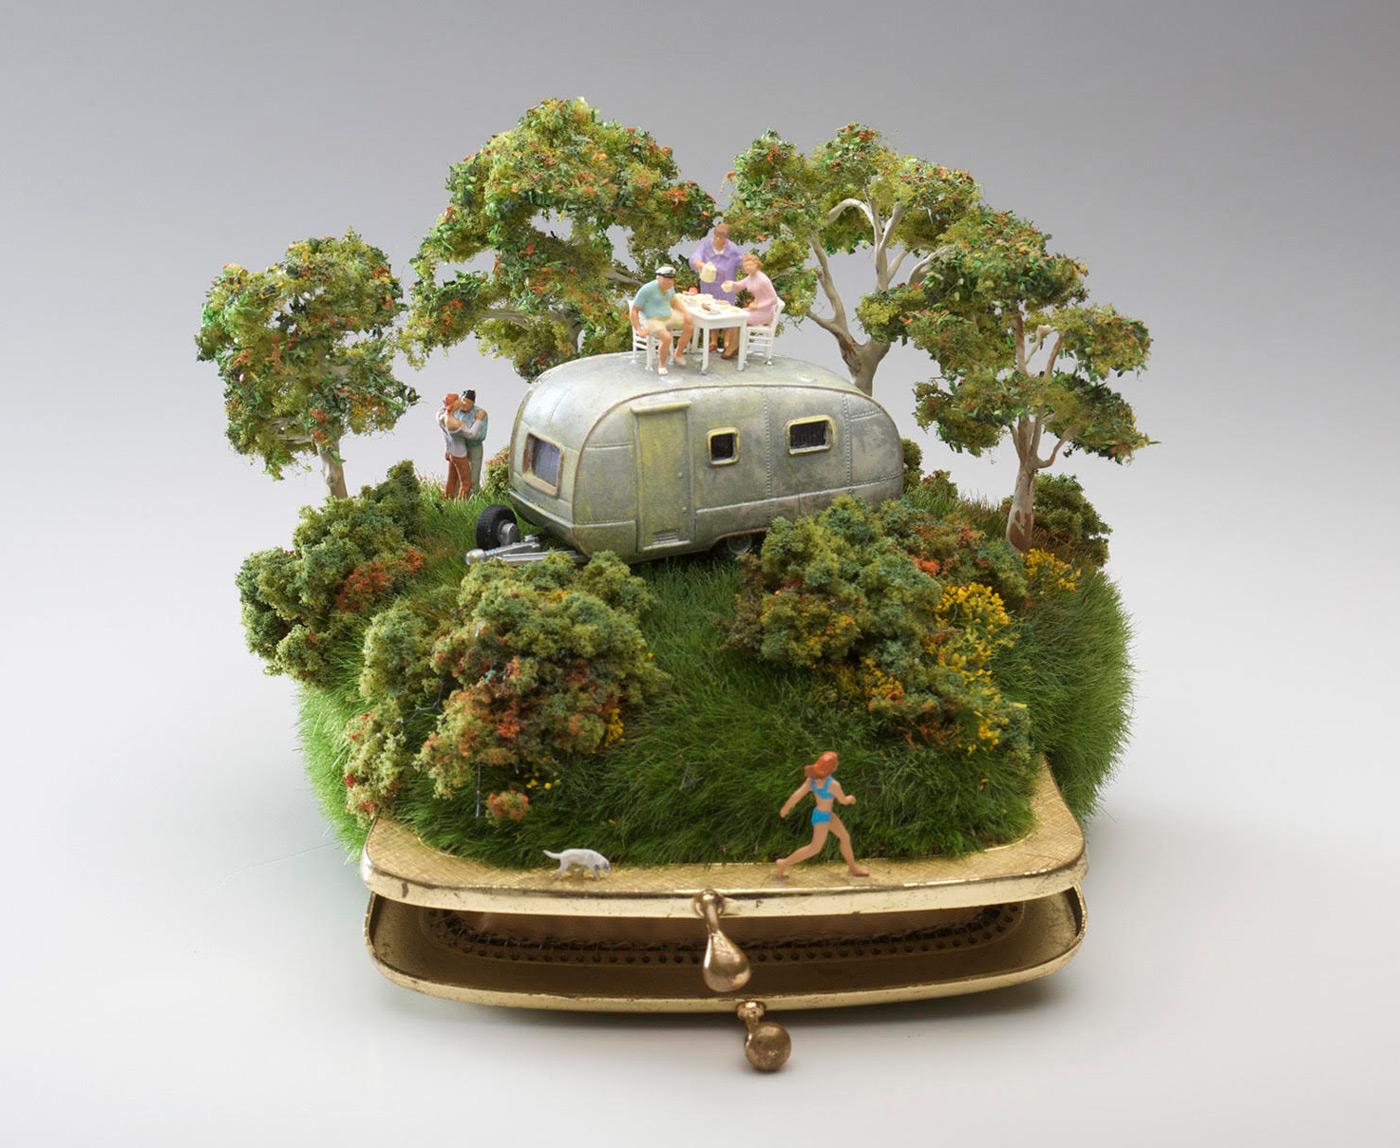 kendal-murray-miniatur-szobrai-noko-04.jpg